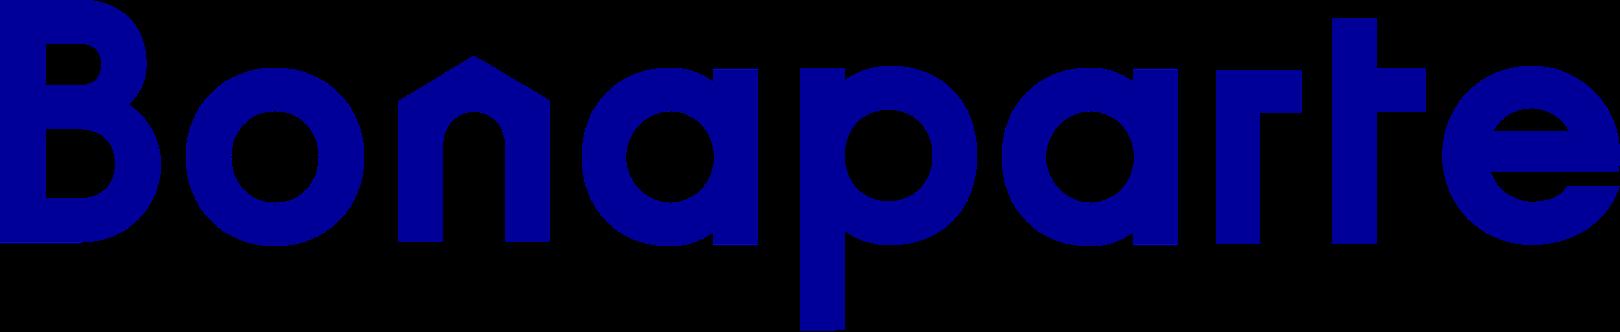 Bonaparte-logo-dblue.png